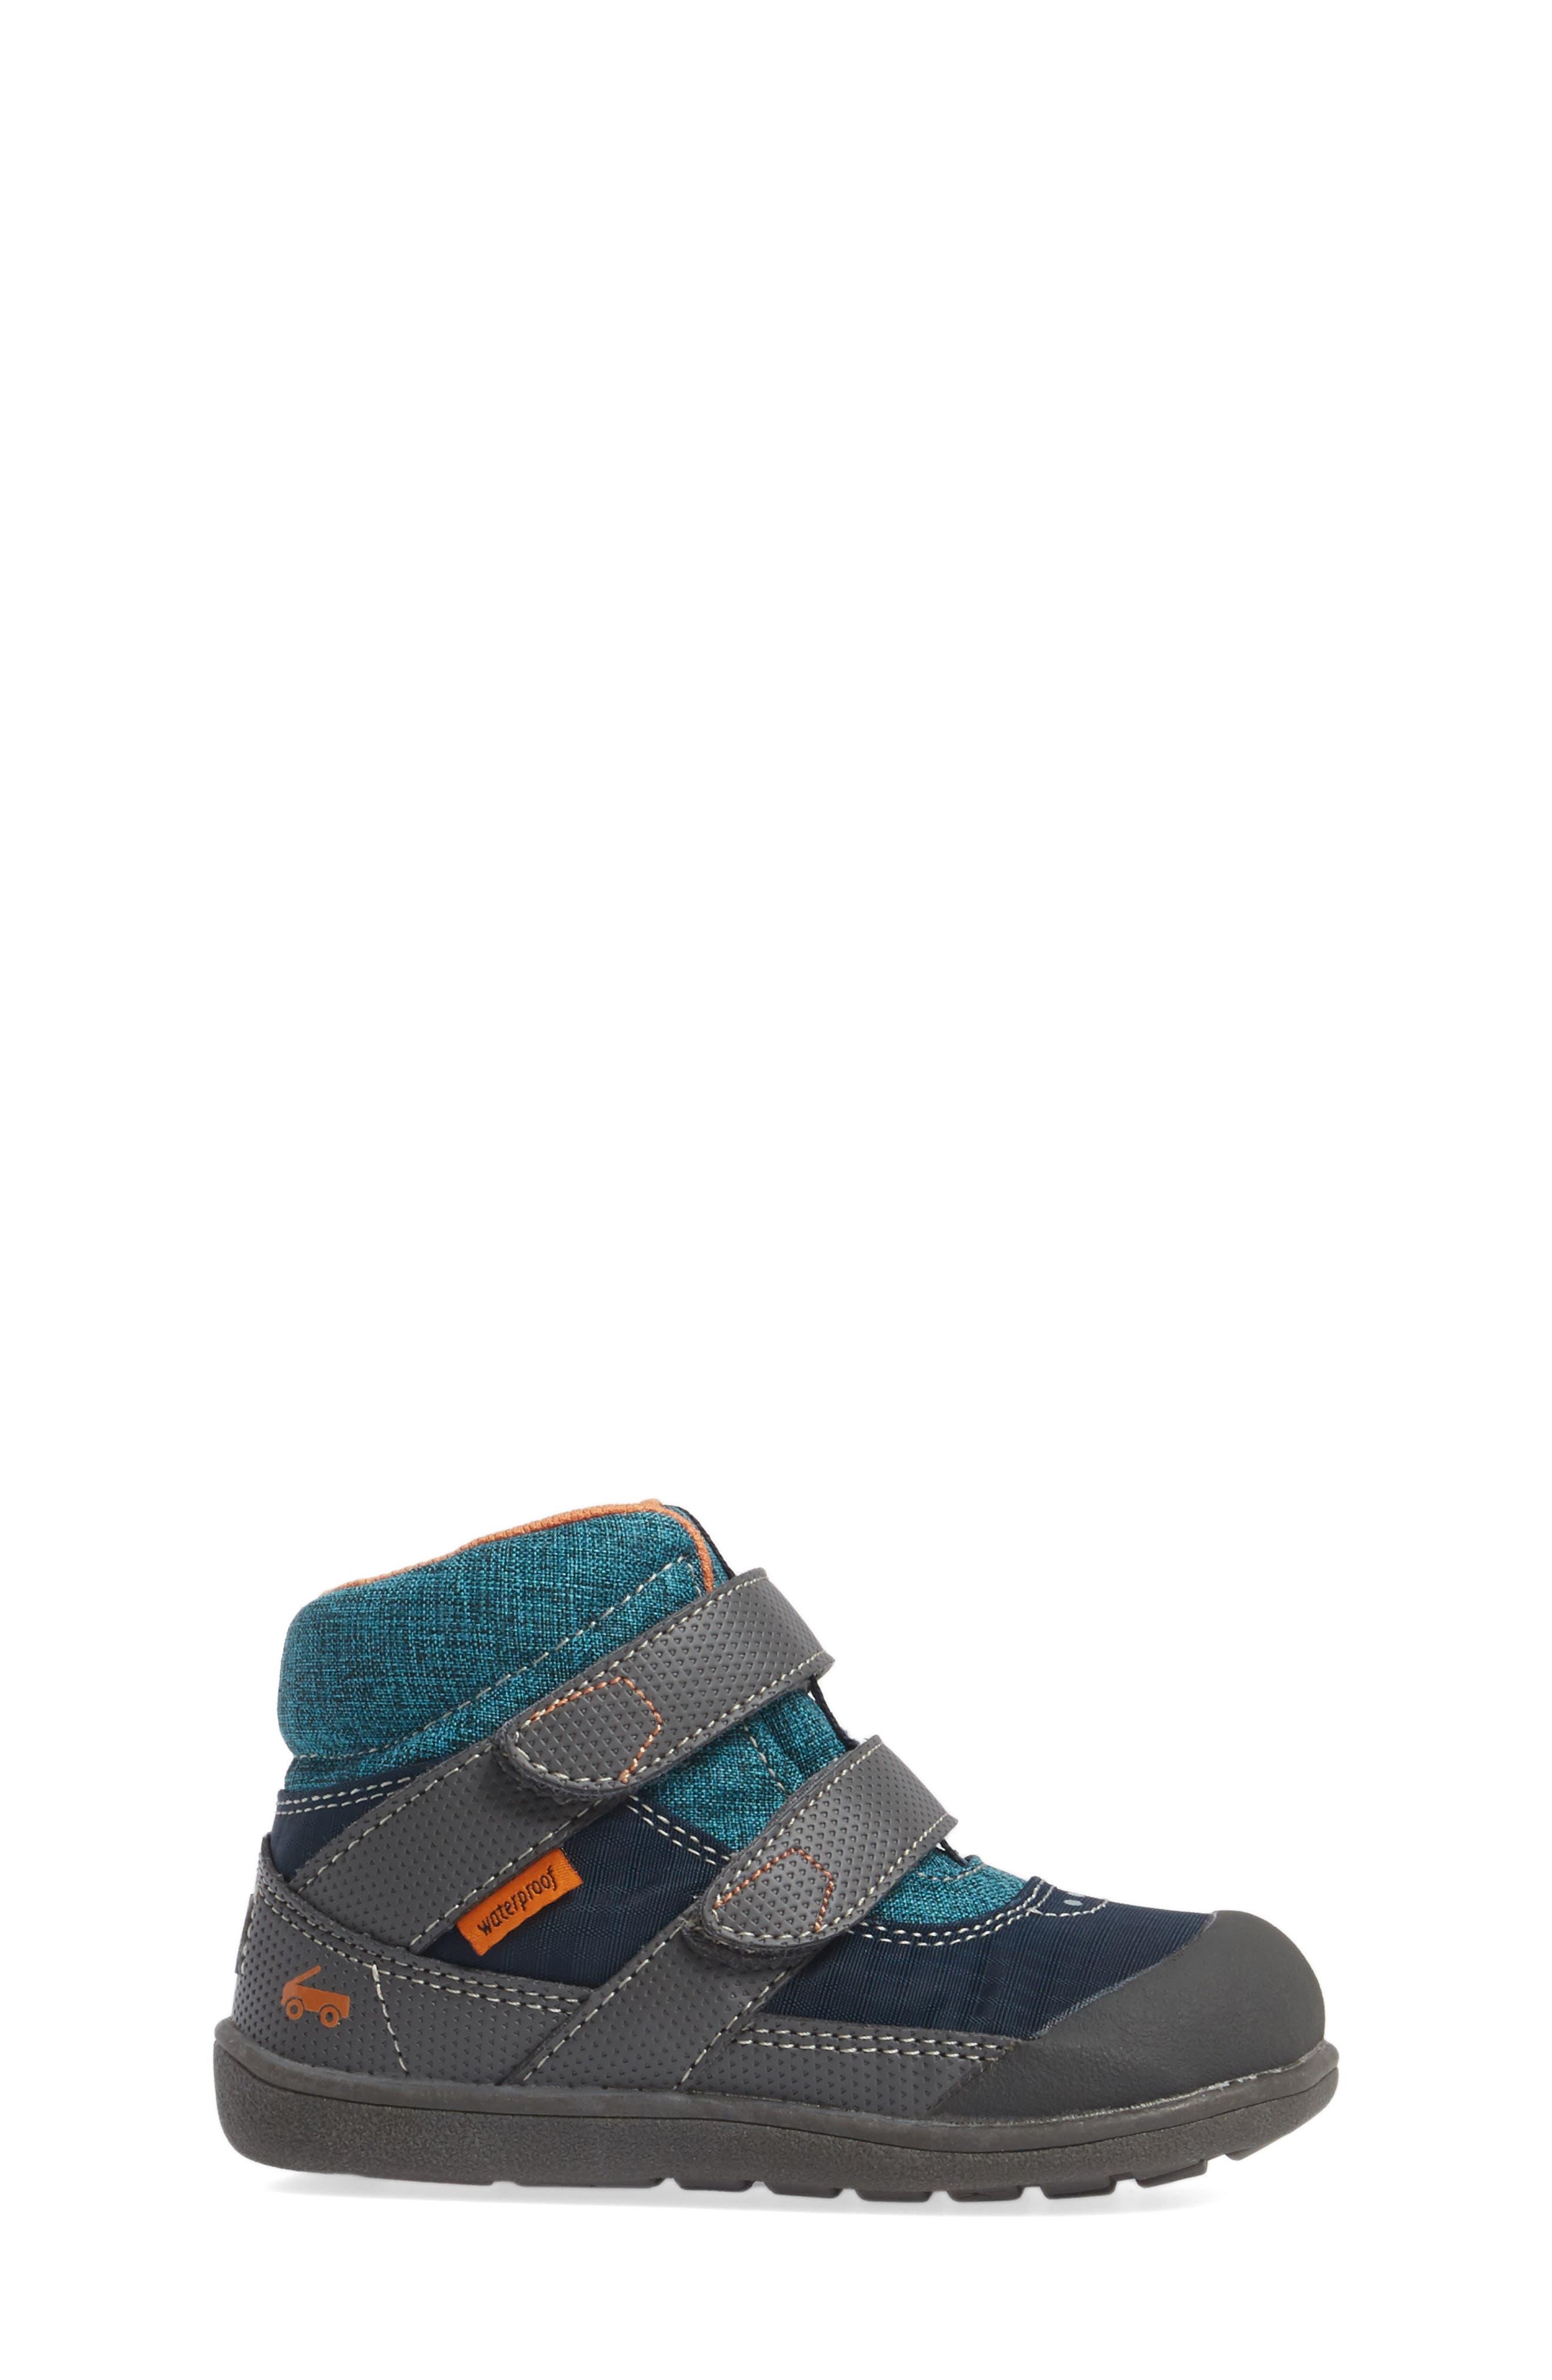 Atlas Waterproof Boot,                             Alternate thumbnail 7, color,